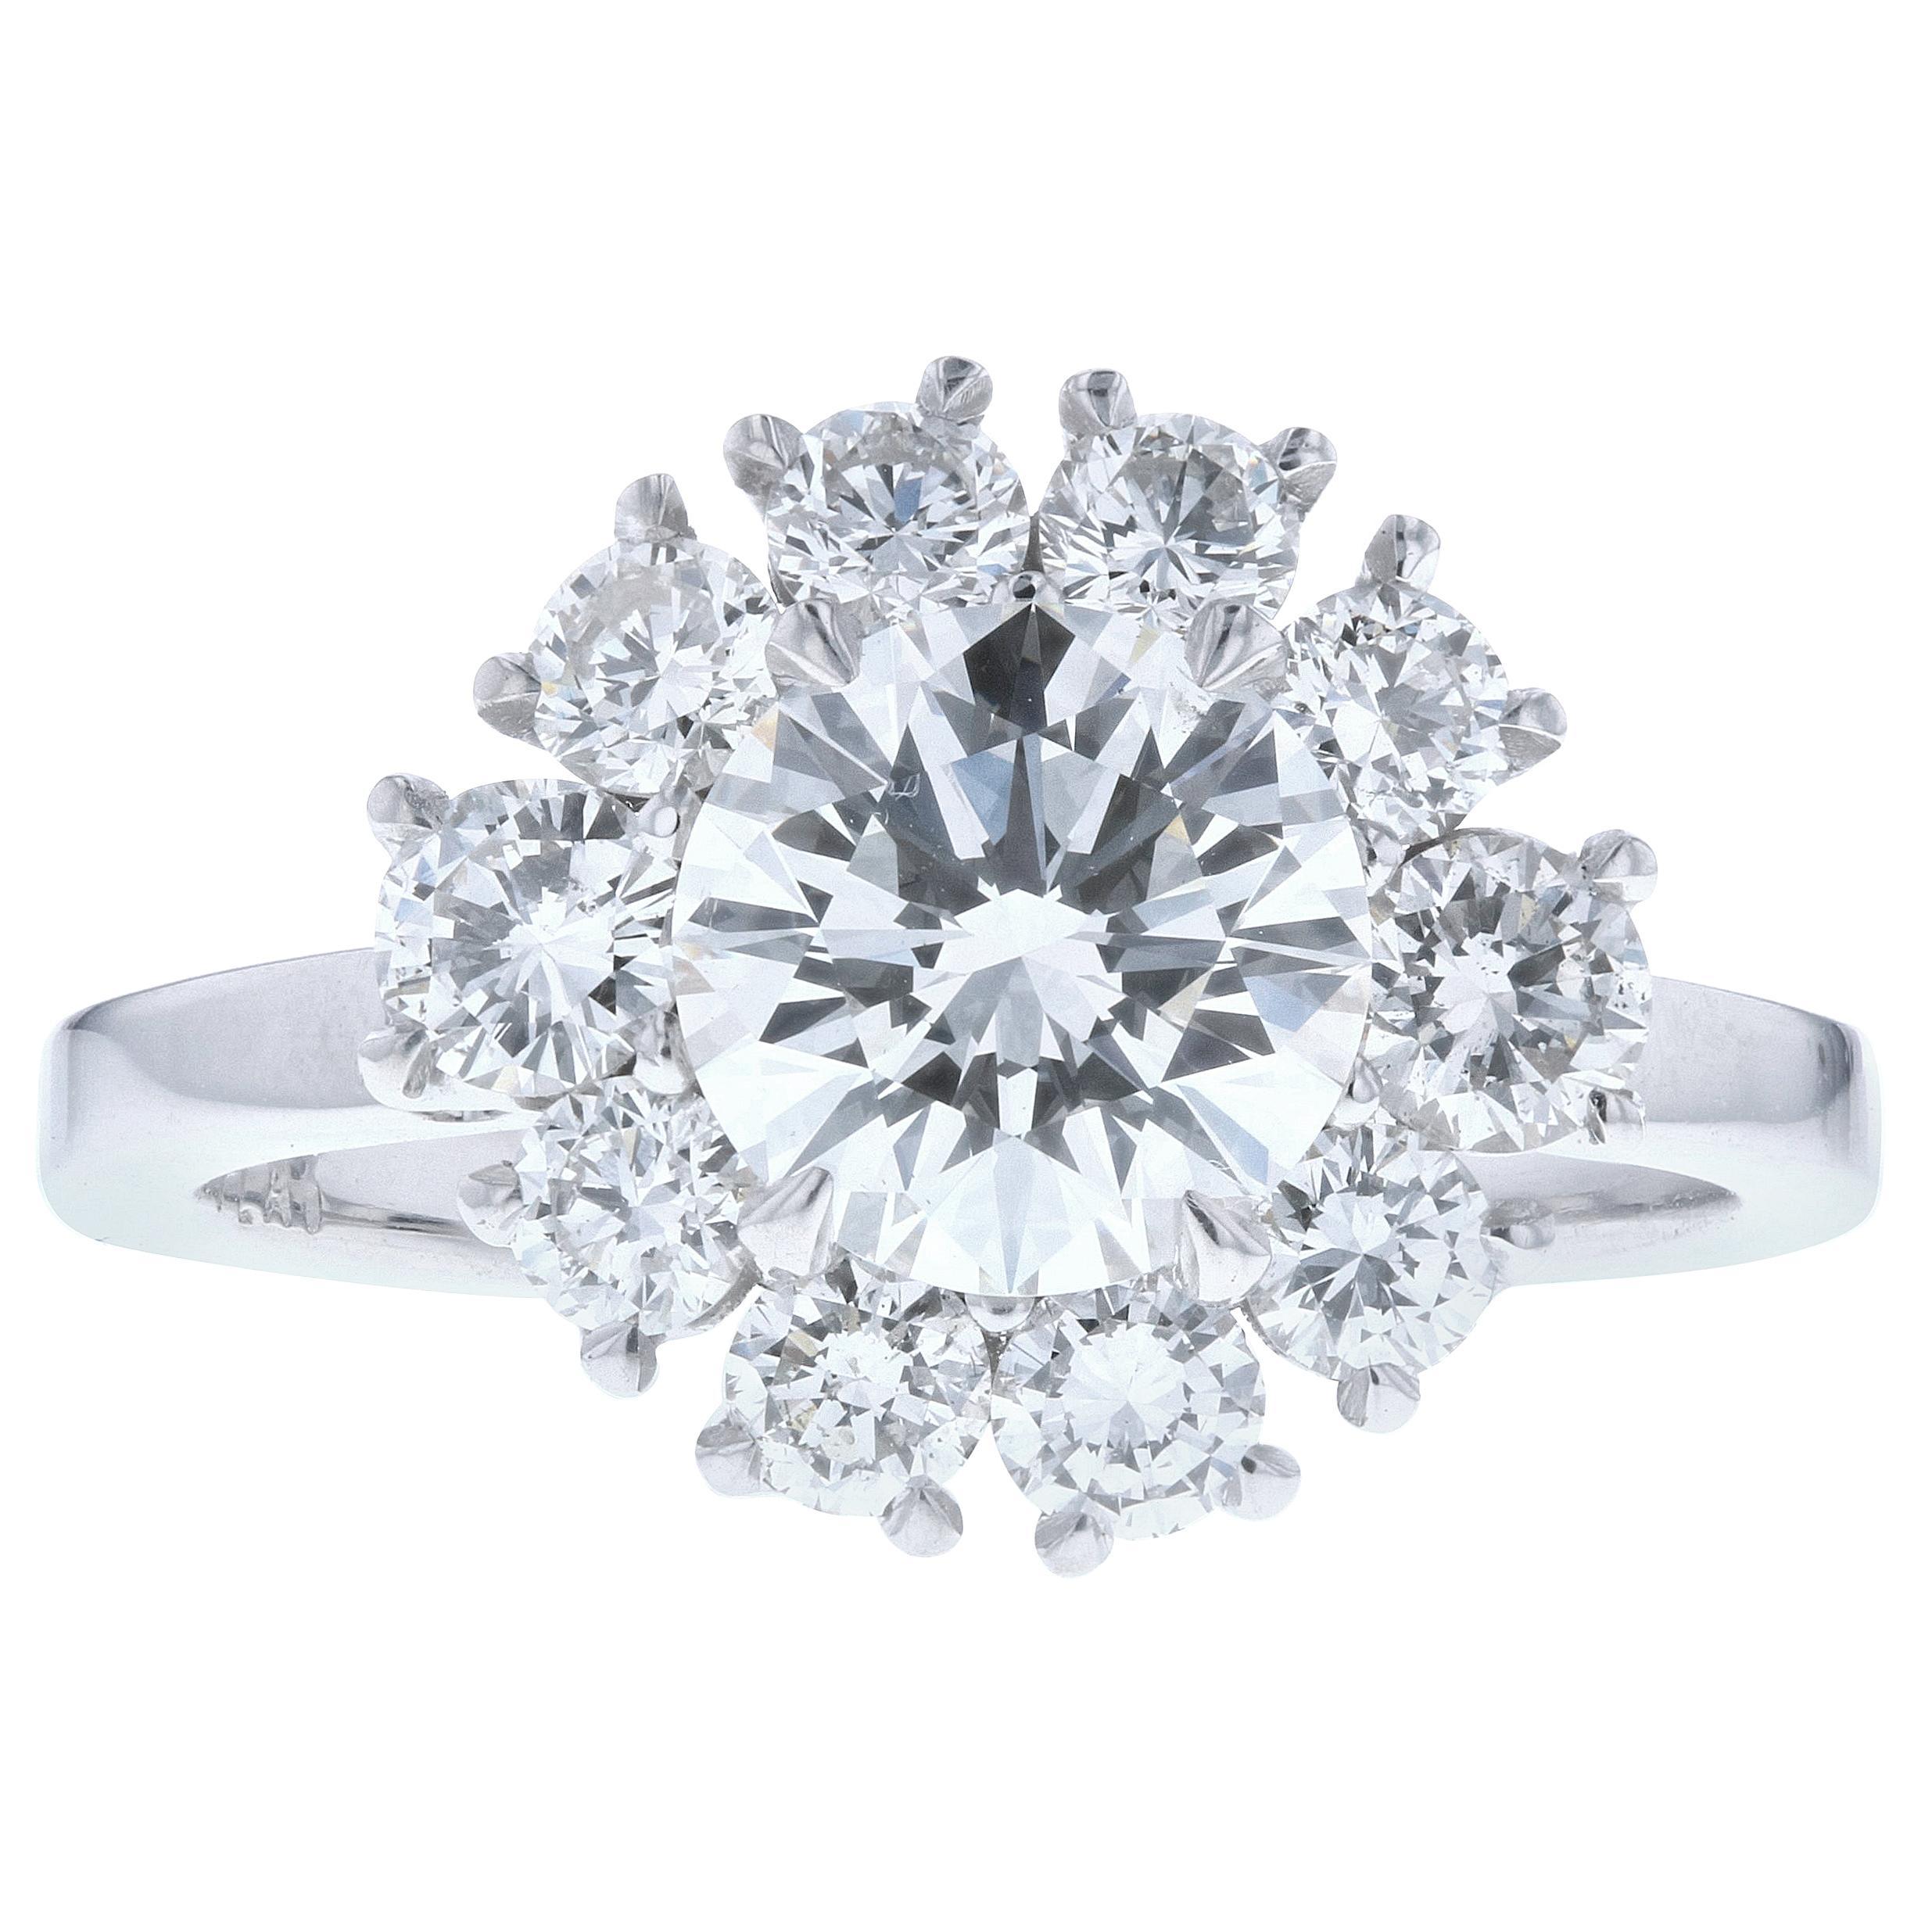 Flower Halo Diamond Engagement Ring 'Round Center'